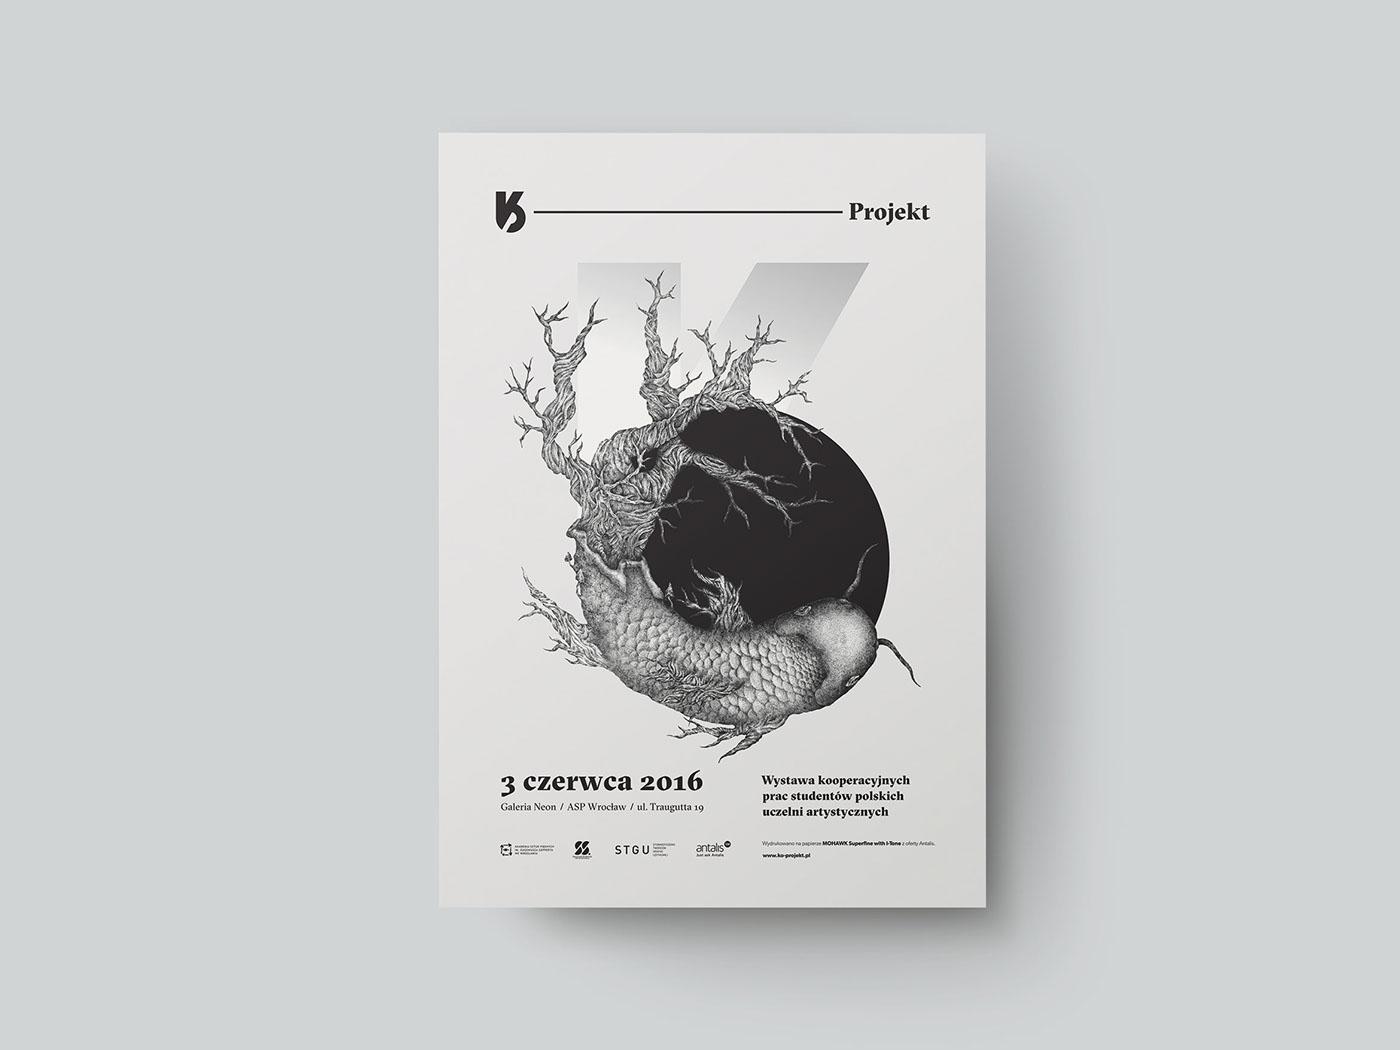 Collaboration exhibiton ILLUSTRATION  hybrids printmaking animals graphic design  adobeawards #semis